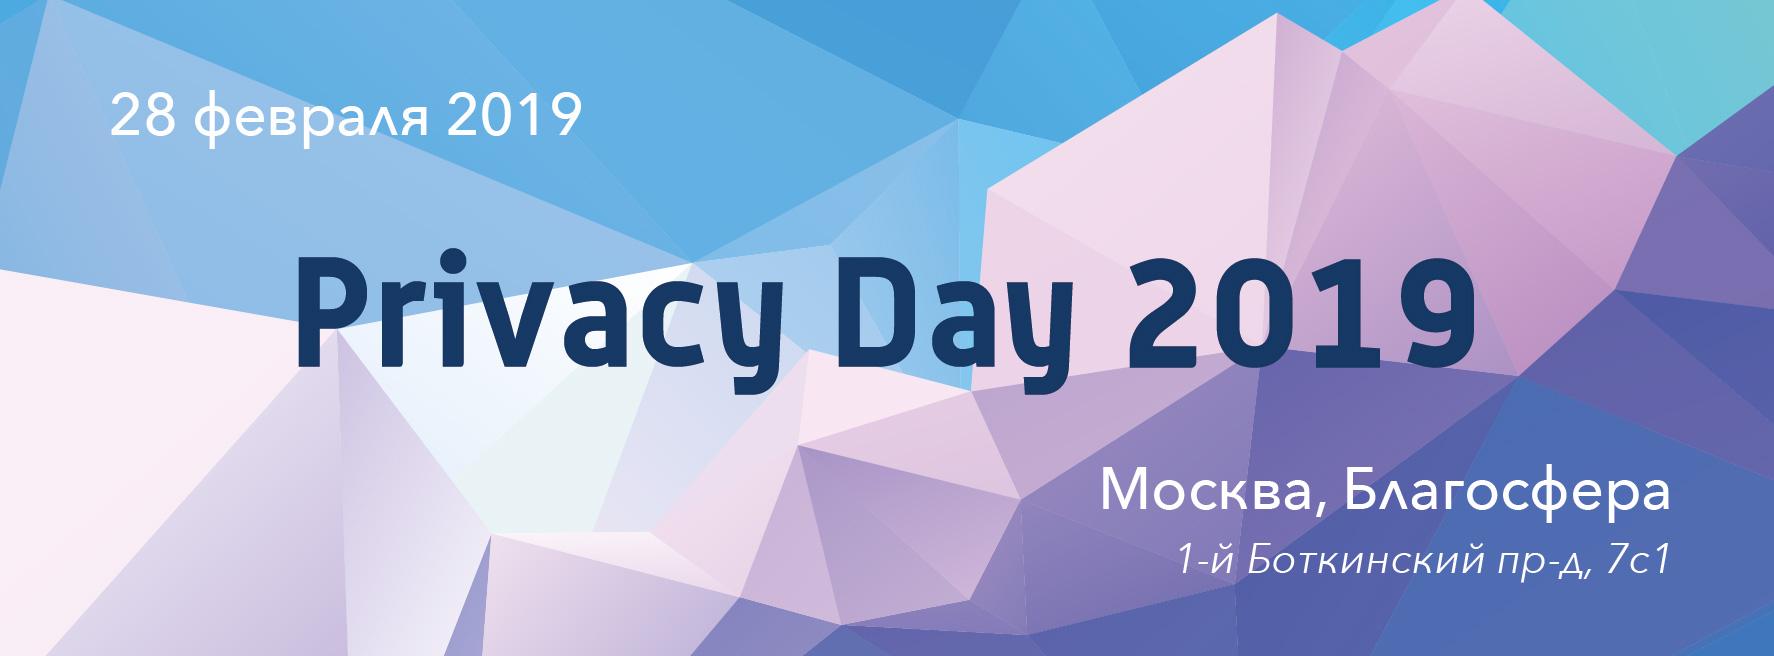 Центр цифровых прав приглашает на Privacy Day 2019